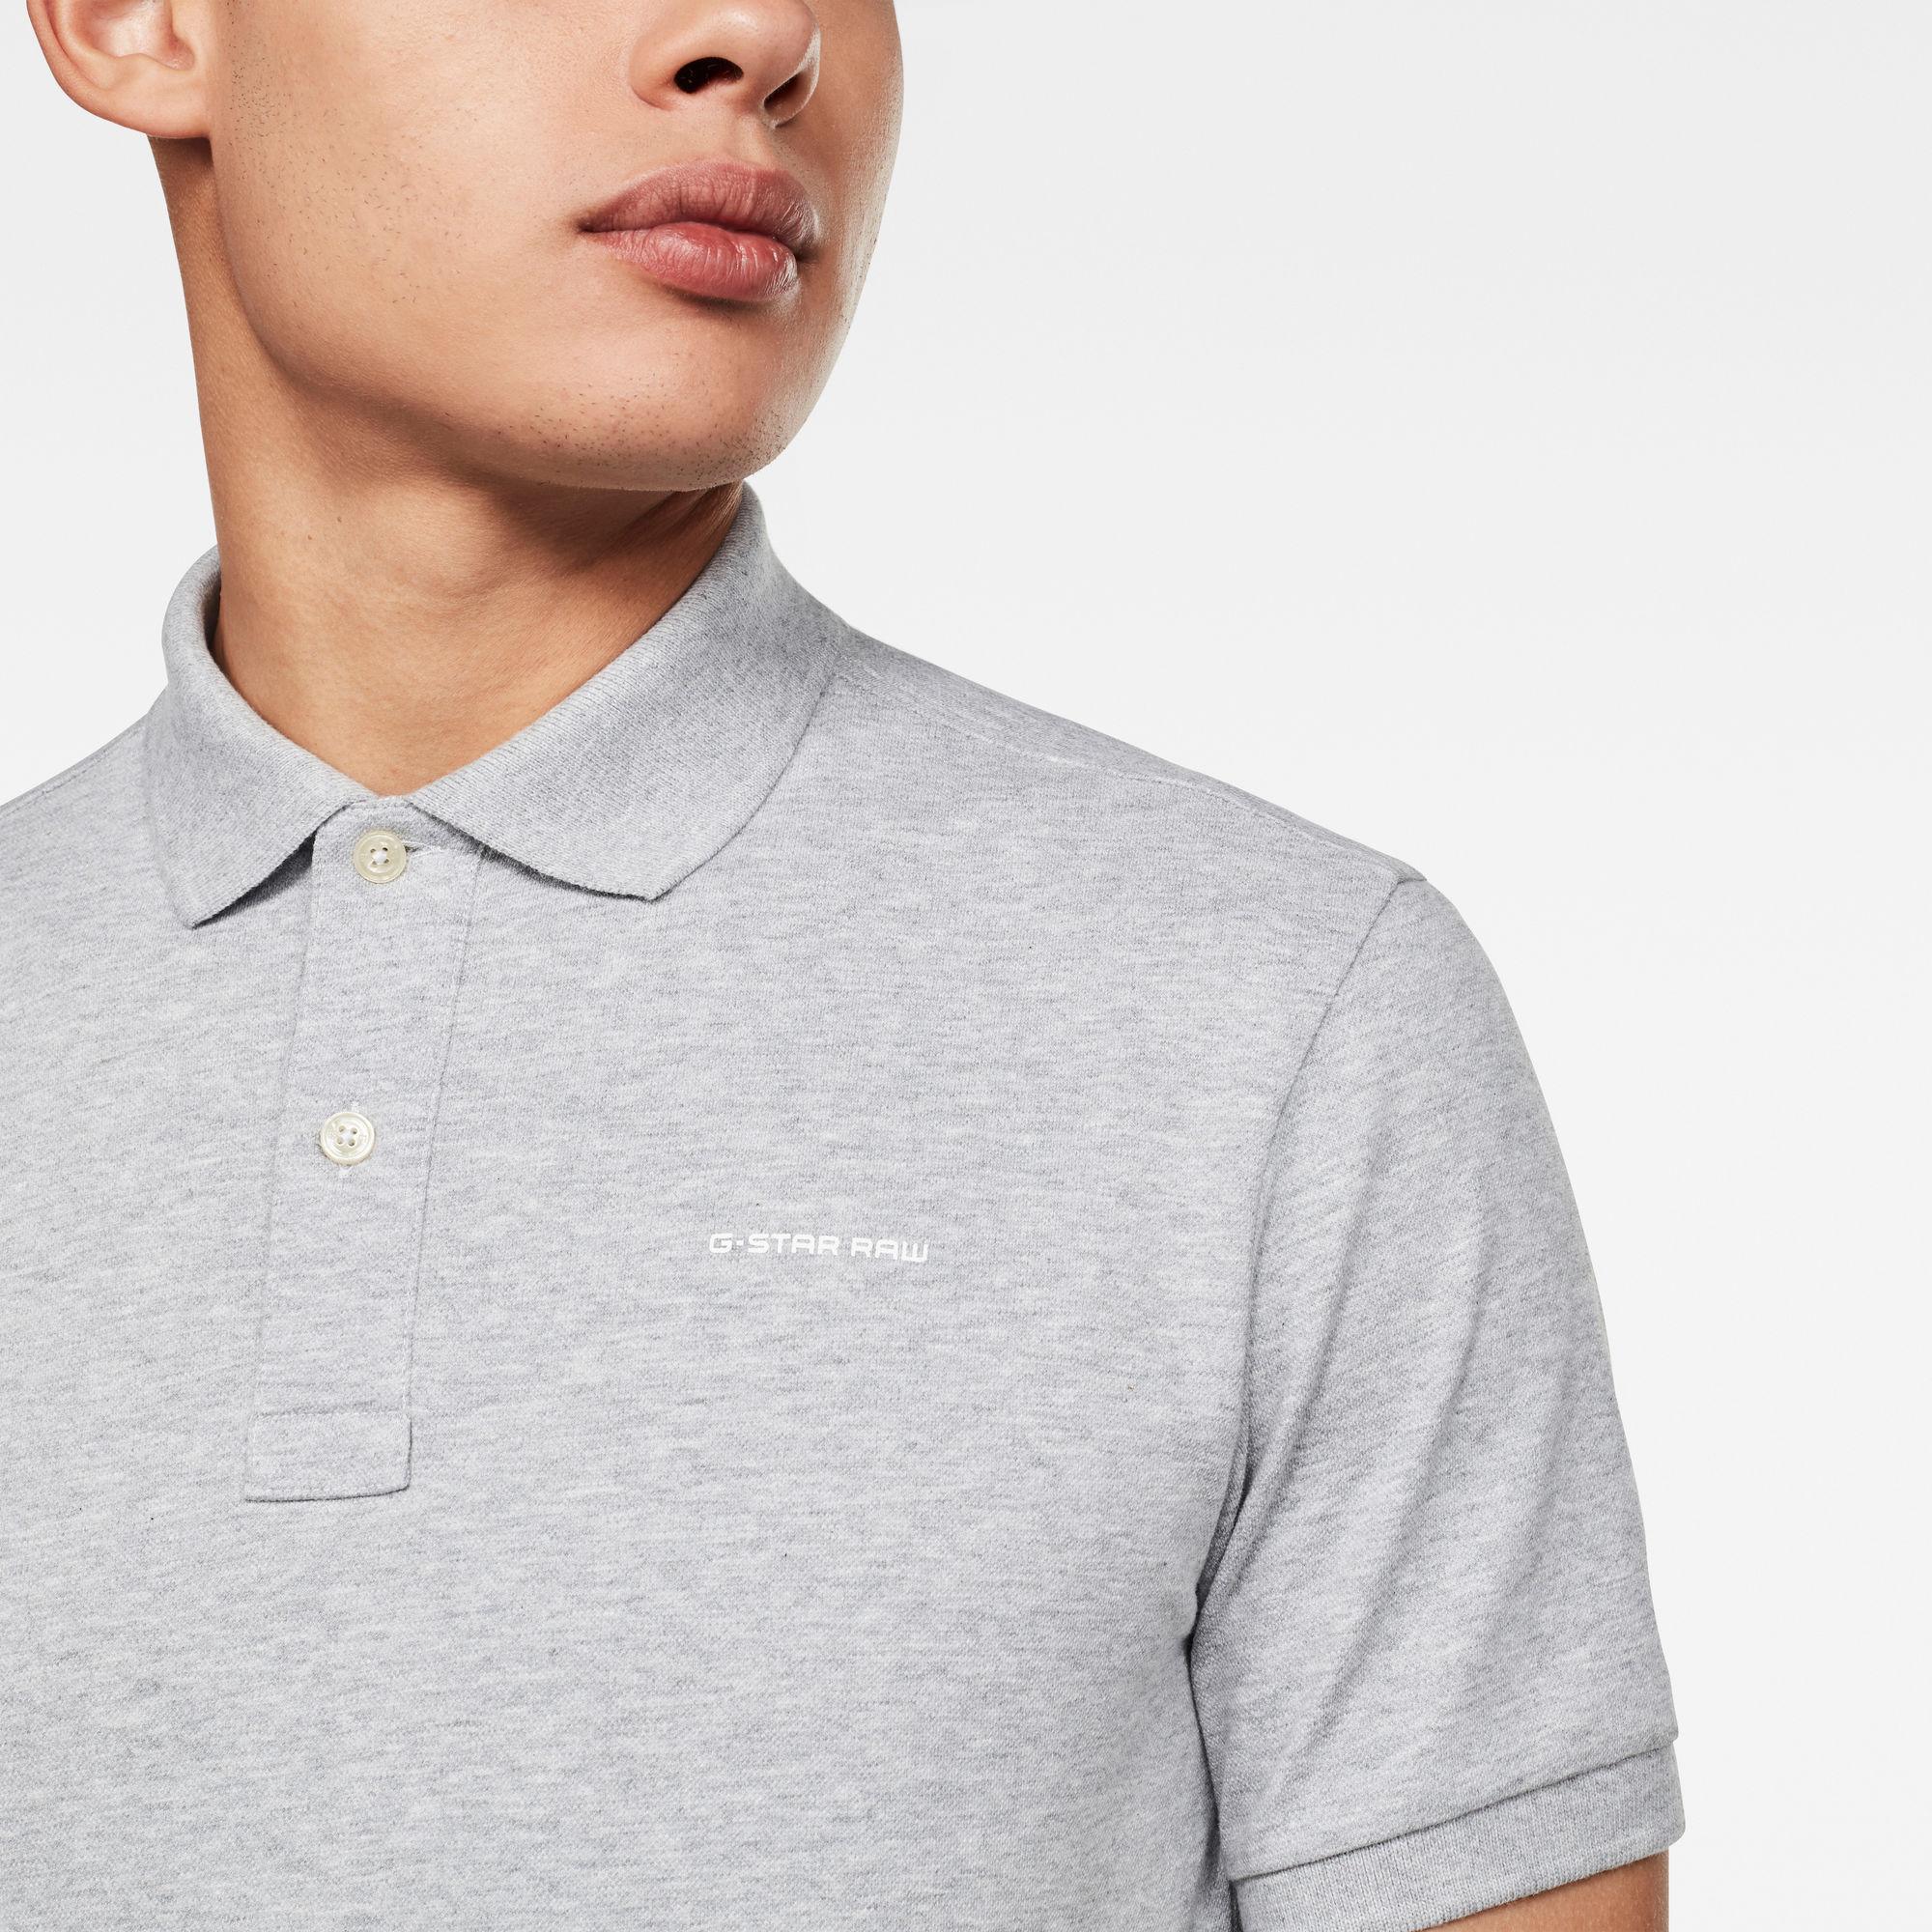 G-Star RAW Neu Herren Oluv Poloshirt